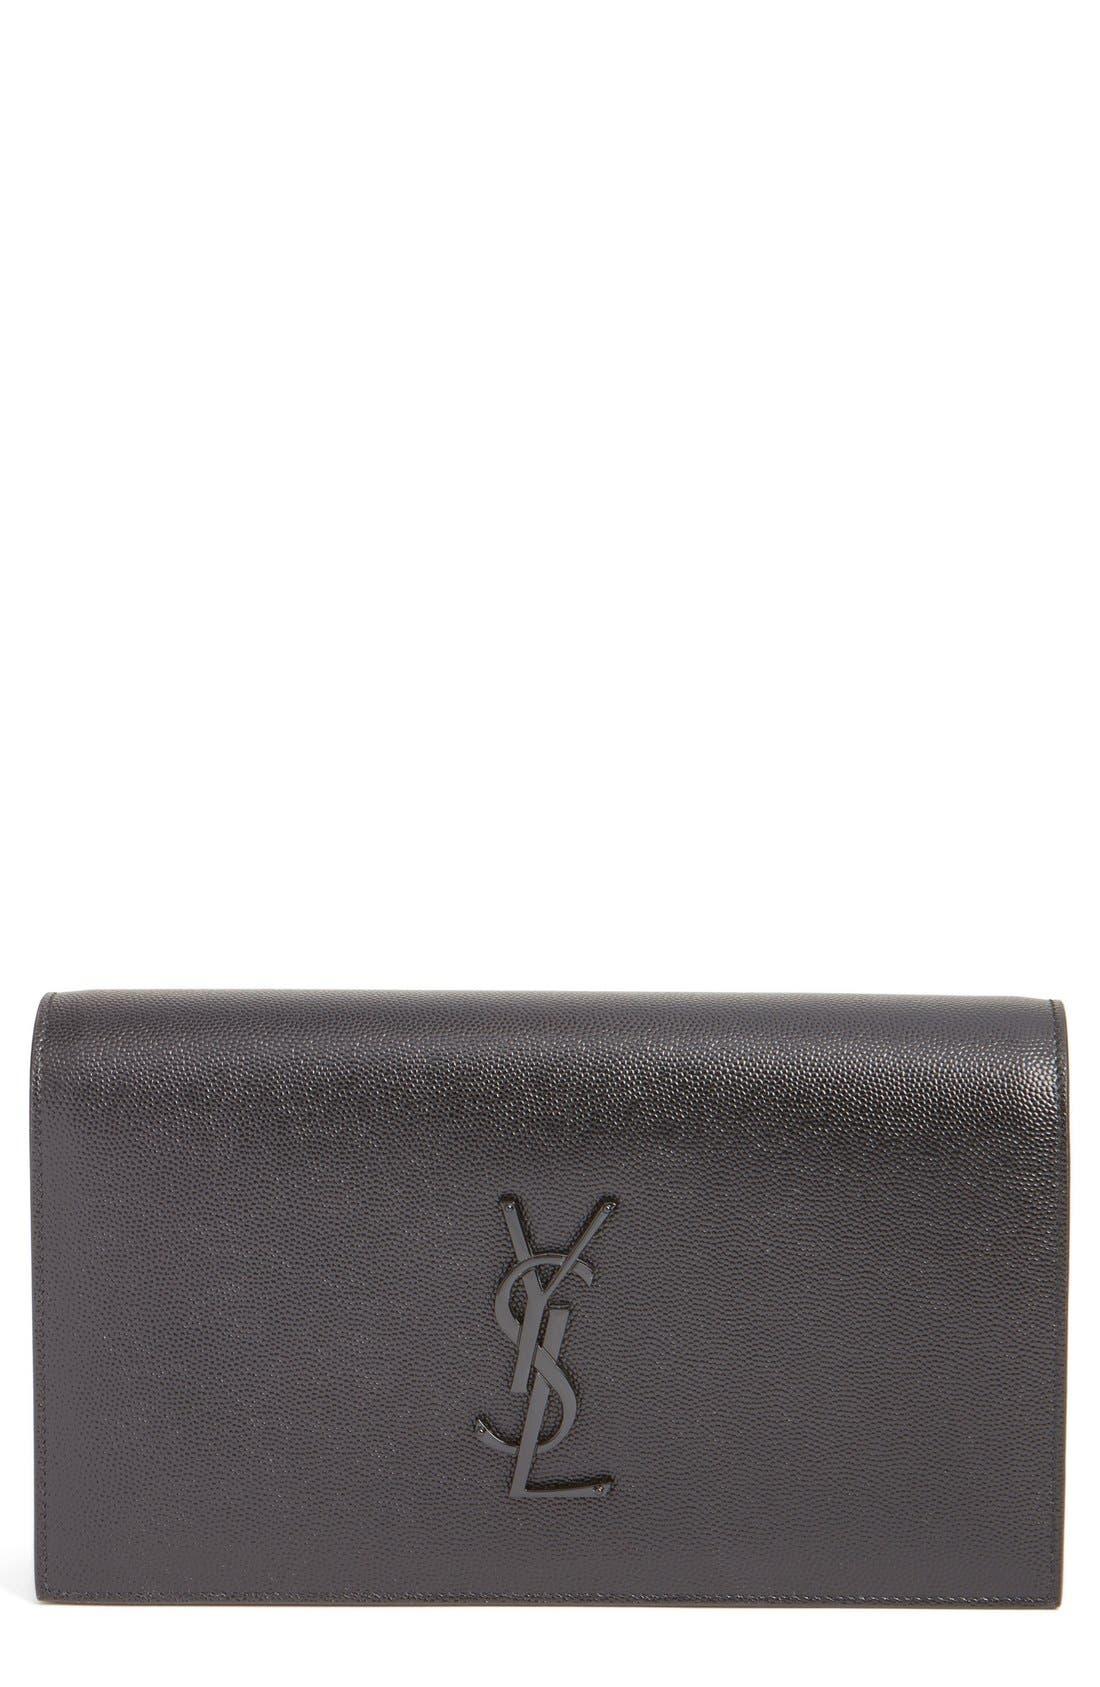 Alternate Image 1 Selected - Saint Laurent 'Kate' Pebbled Calfskin Leather Clutch